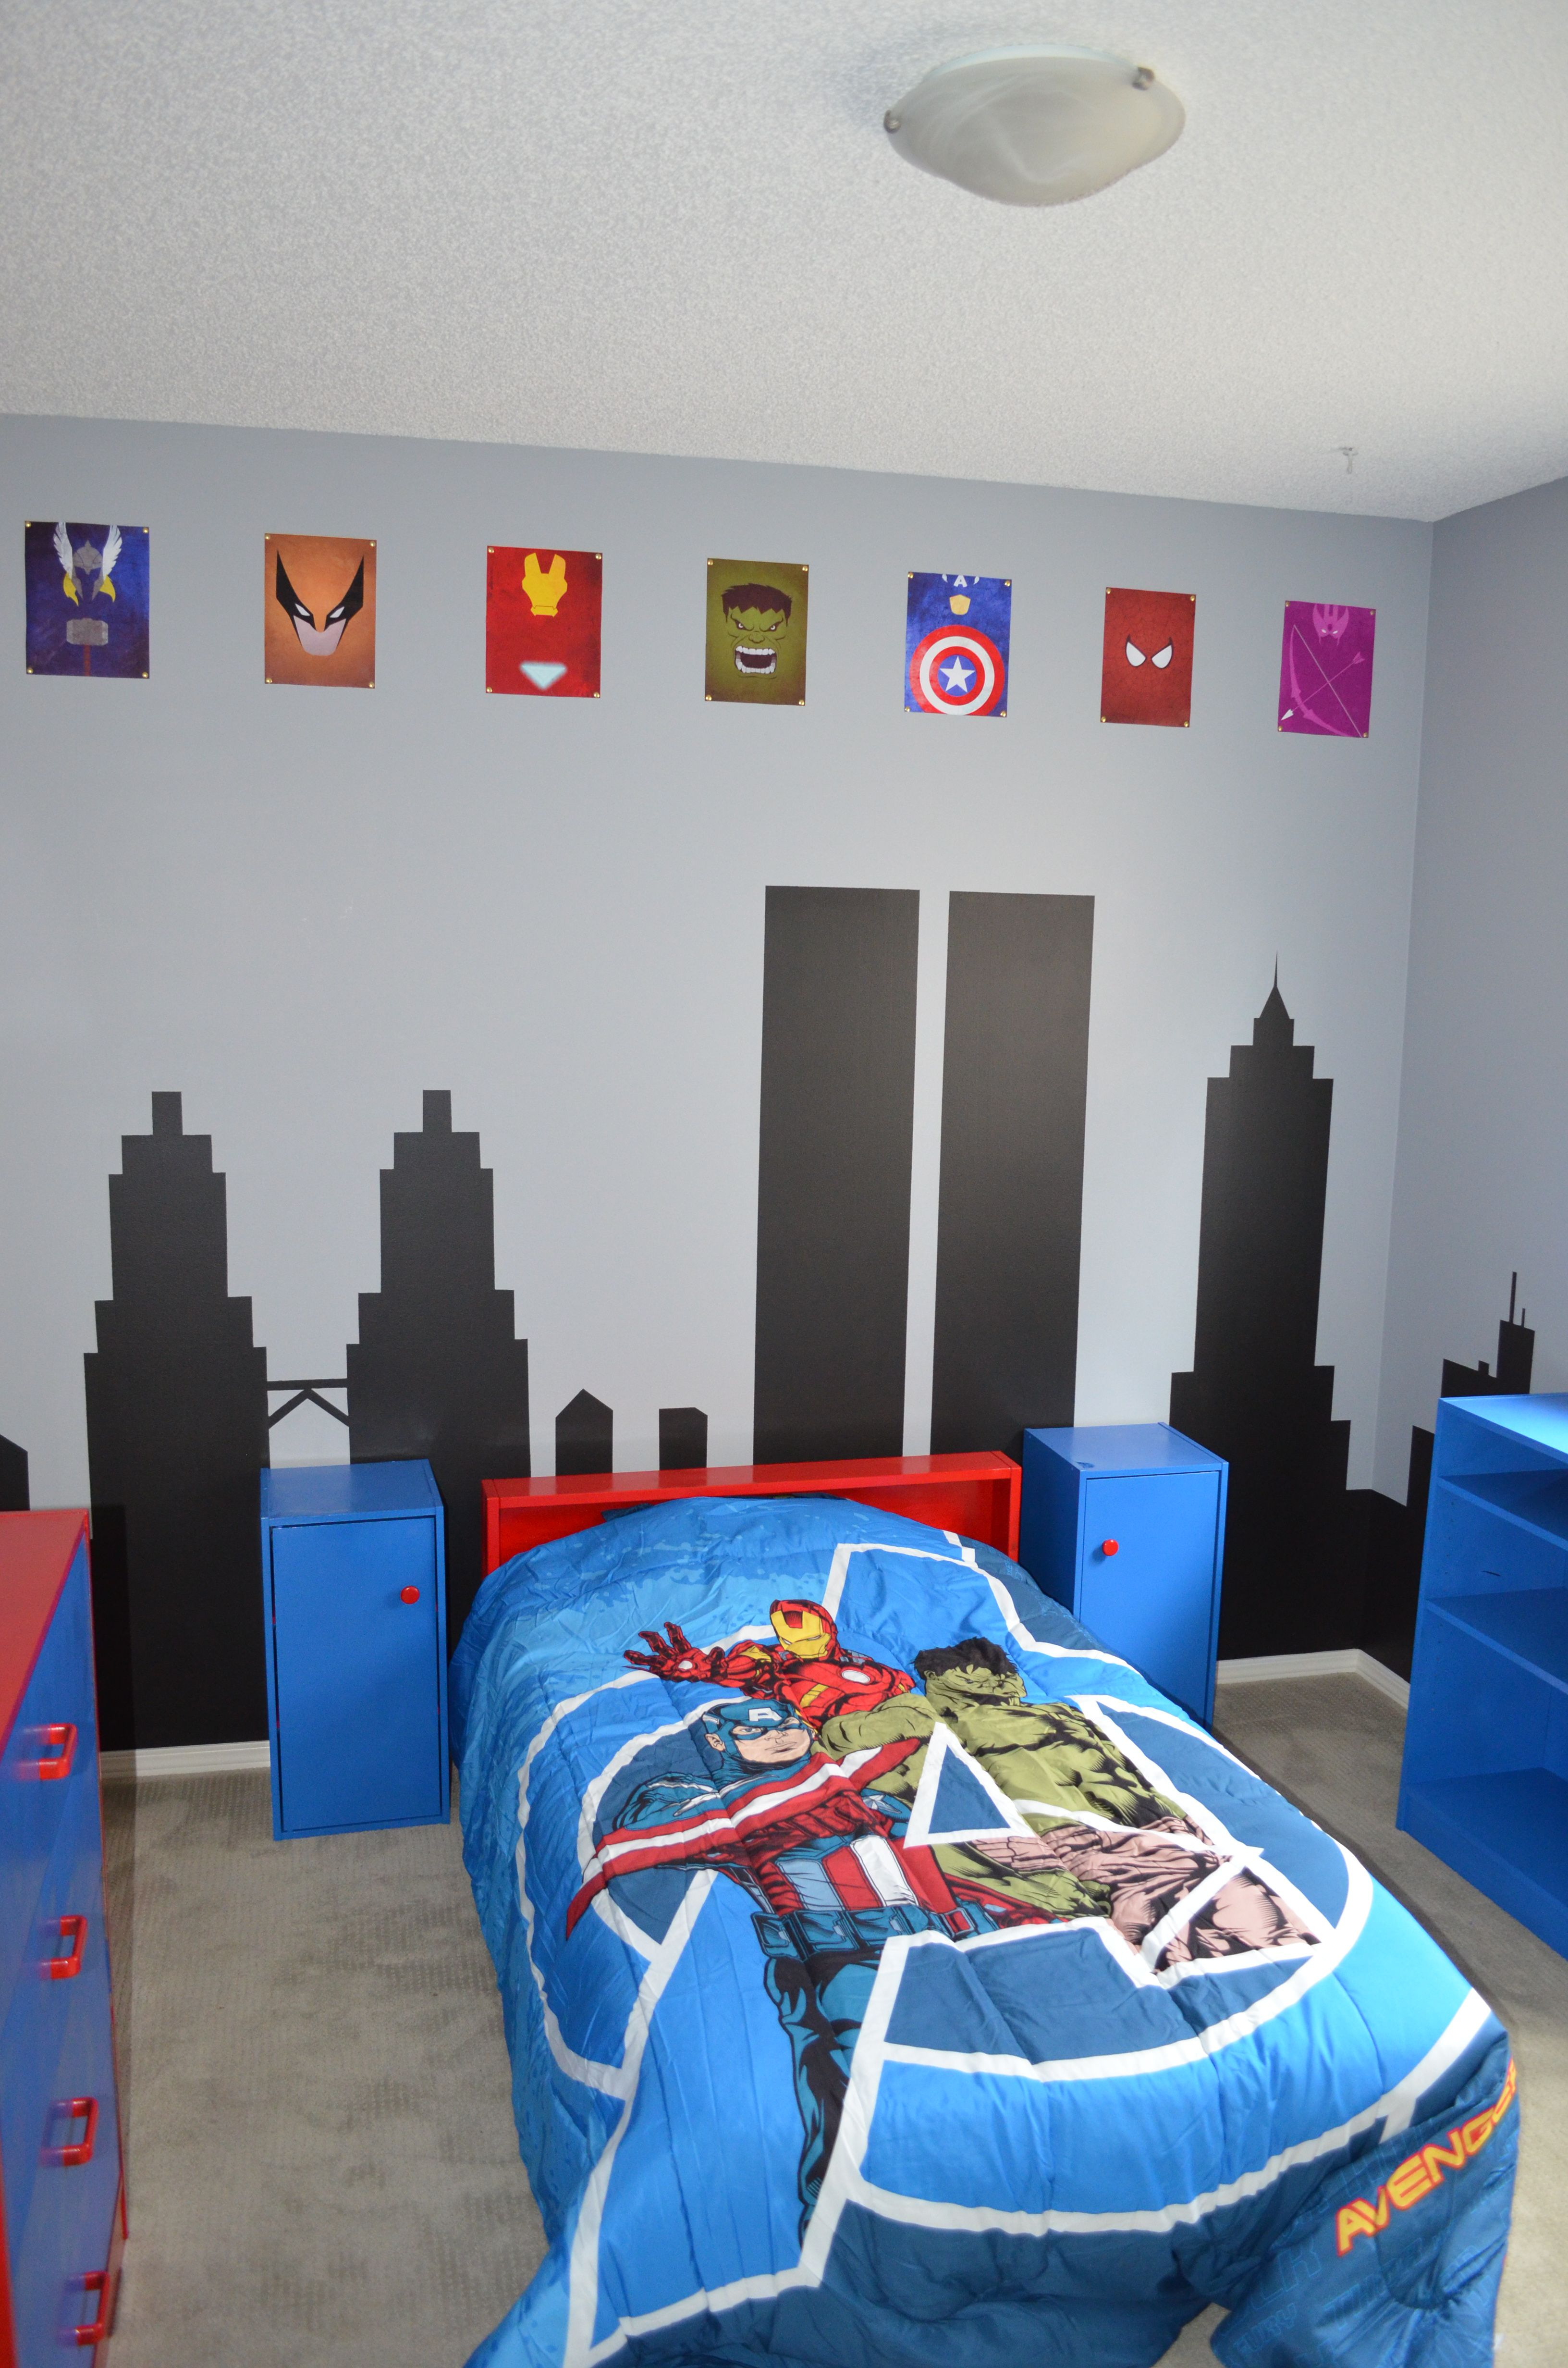 Superhero Shower Curtain Super Hero Shower By PrintArtShoppe For - Avengers bathroom decor for small bathroom ideas